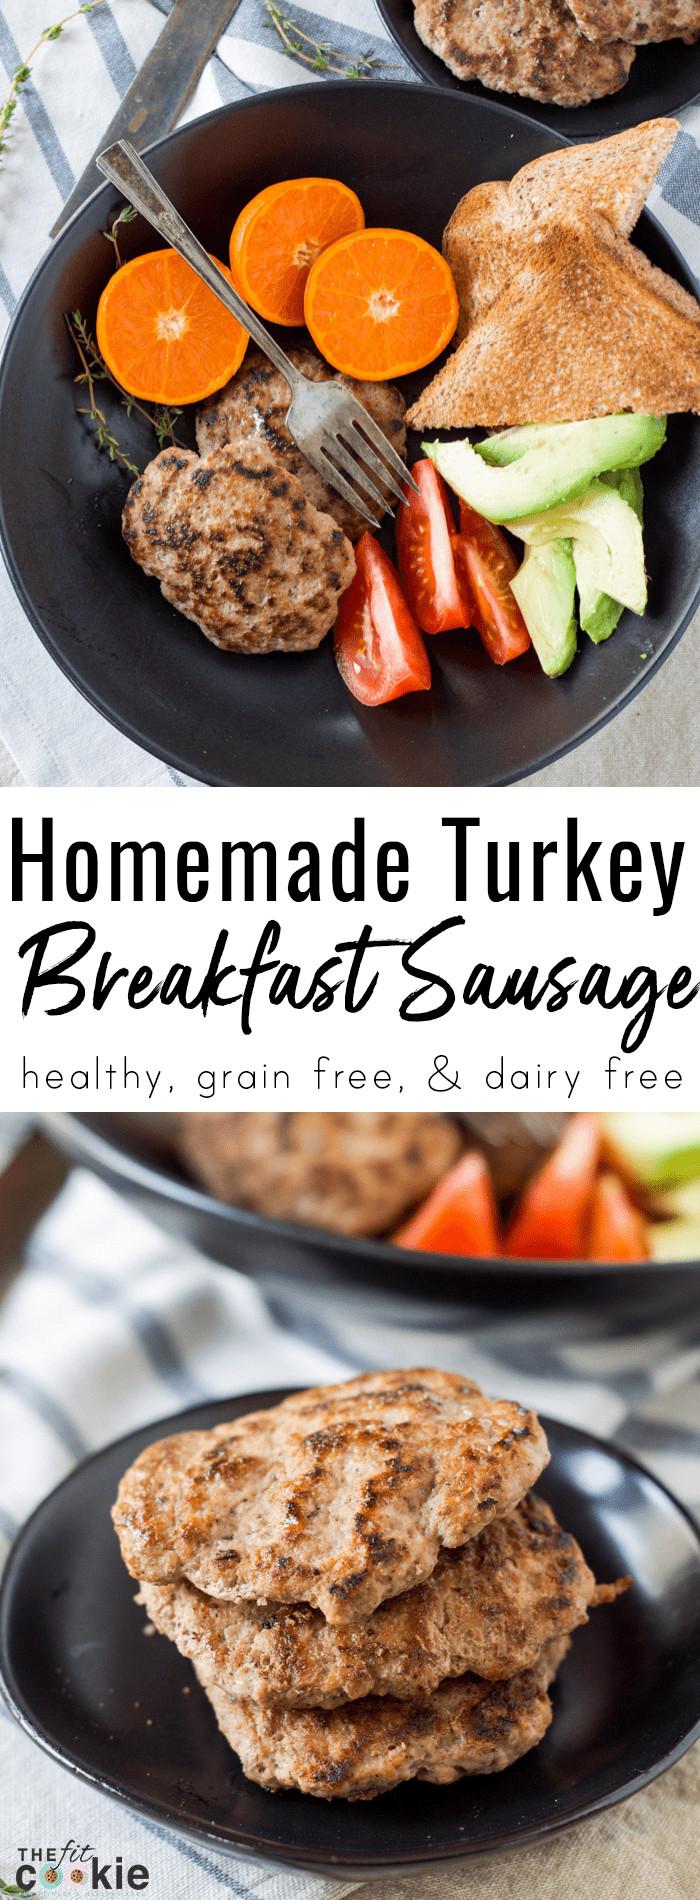 Healthy Homemade Breakfast  Healthy Homemade Turkey Breakfast Sausage Paleo • The